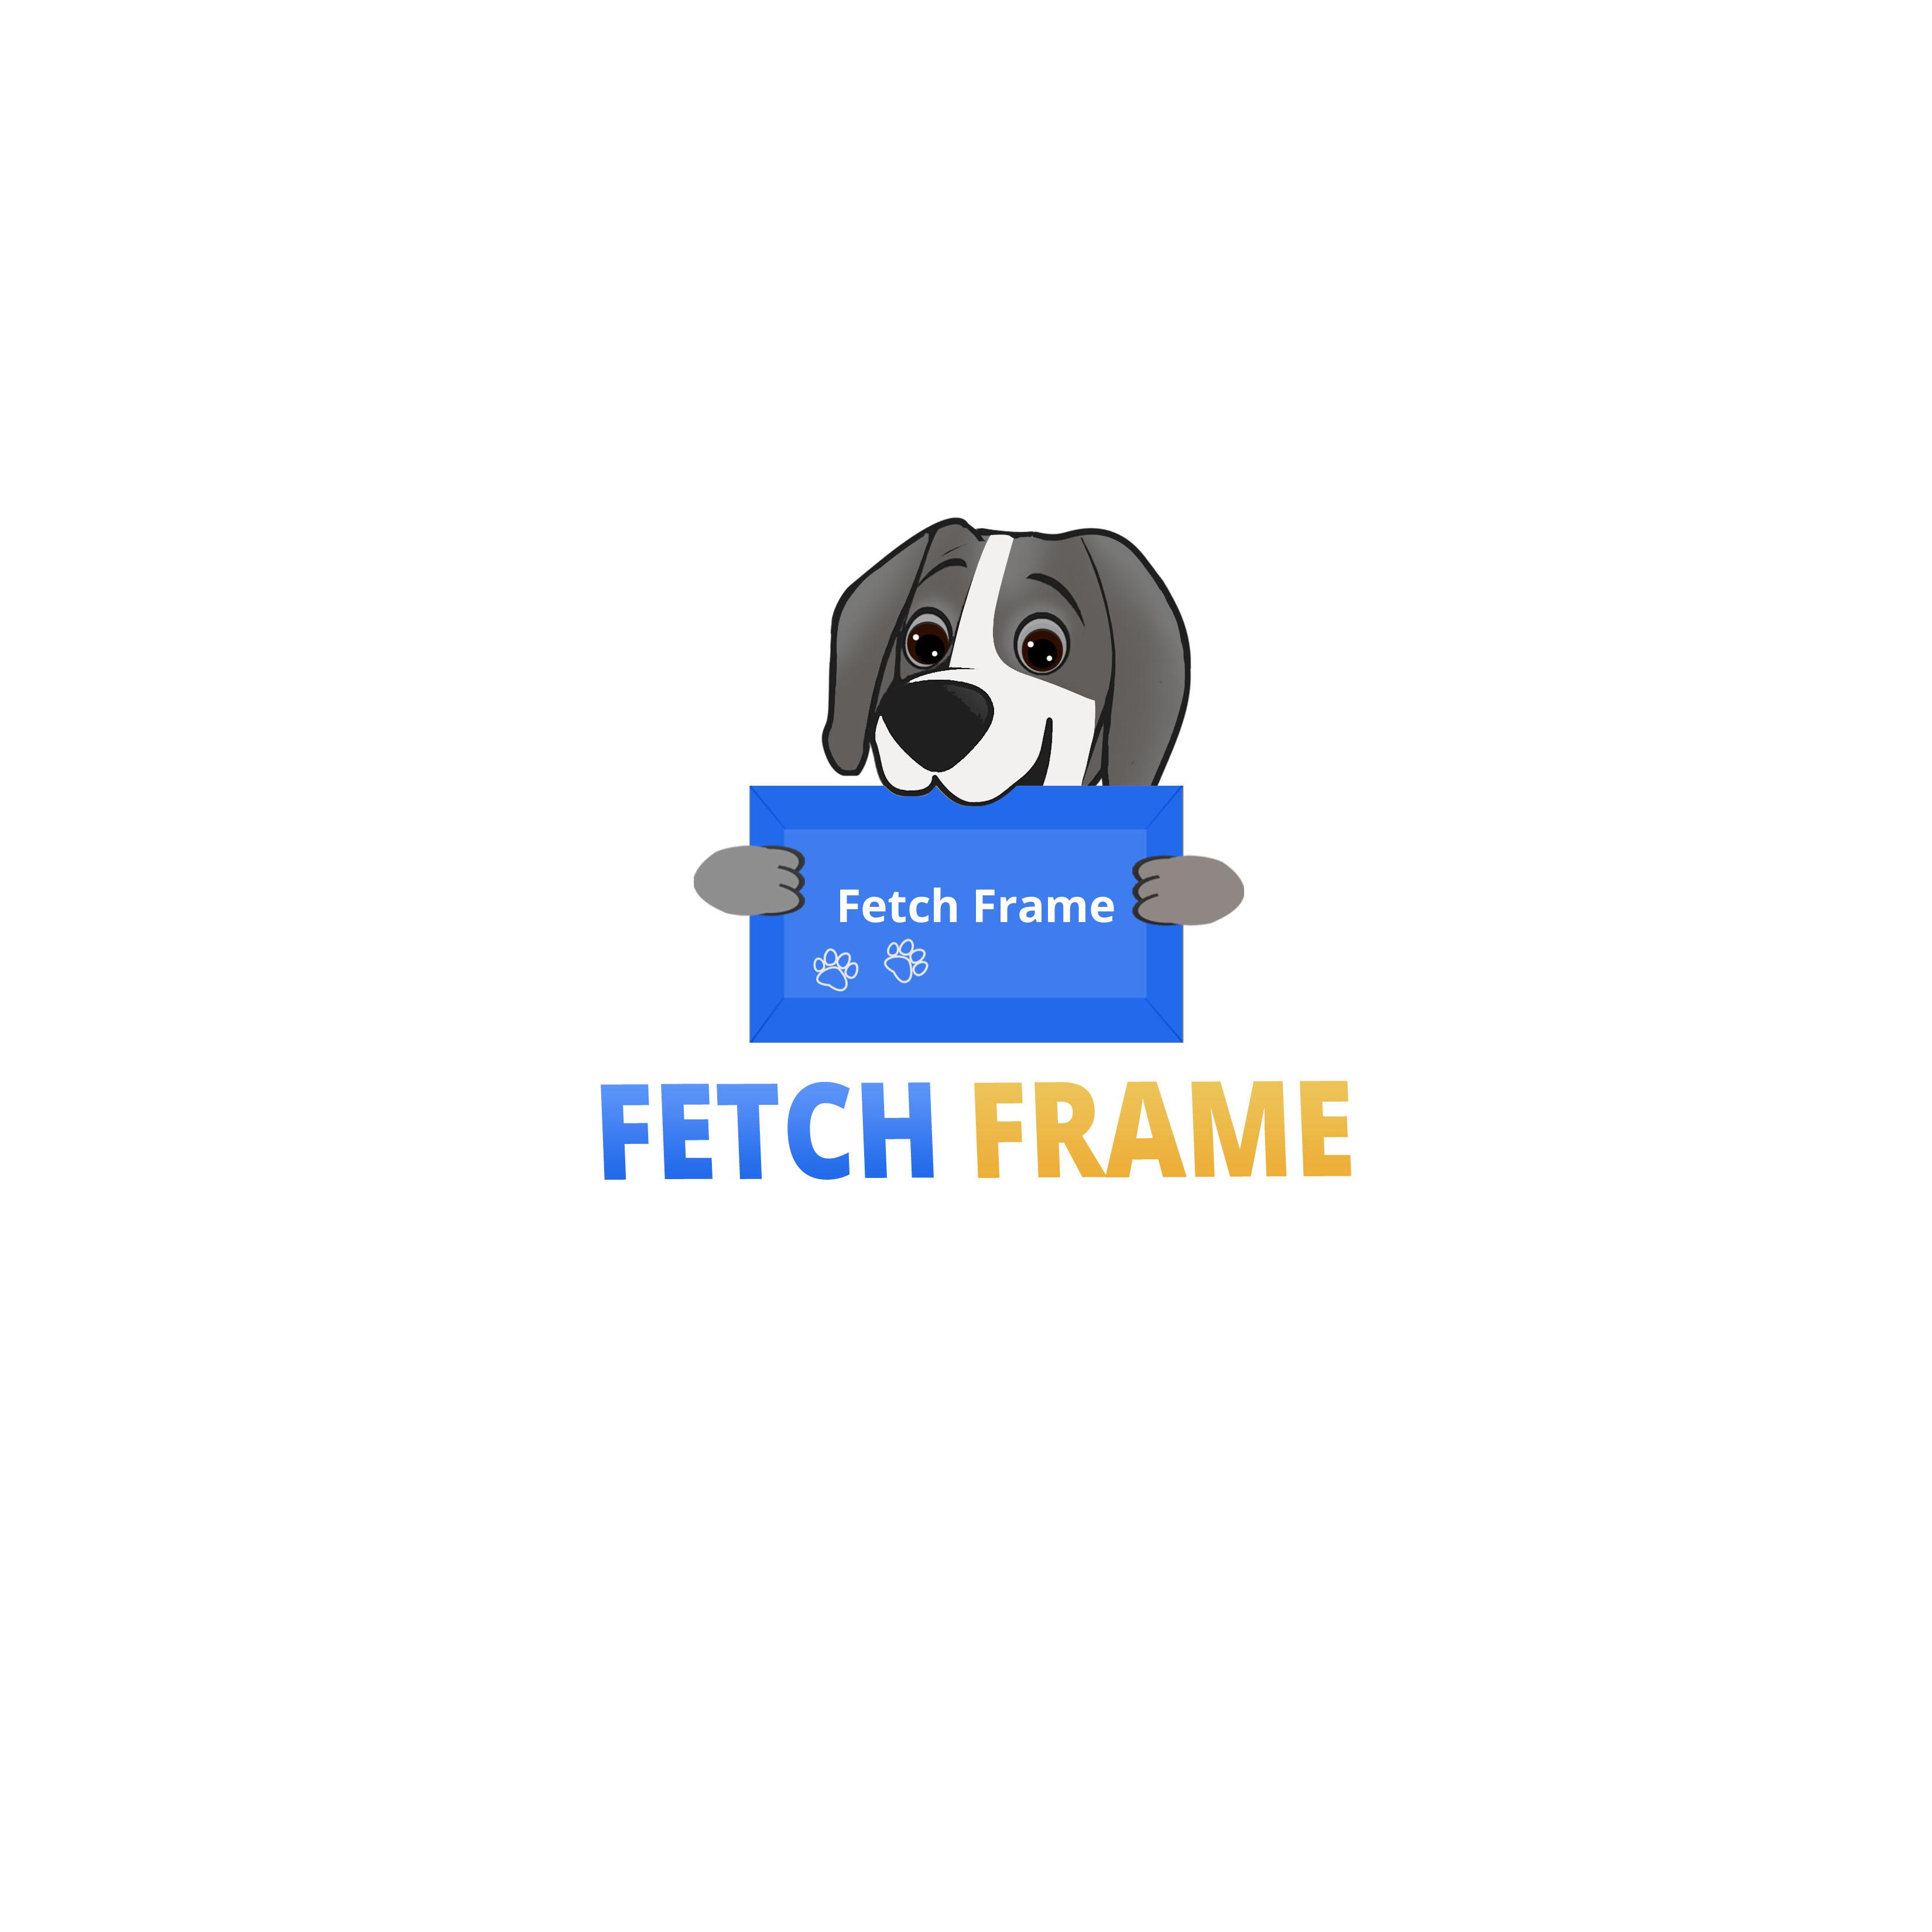 Logo Design by Allan Esclamado - Entry No. 15 in the Logo Design Contest New Logo Design for FetchFrame.